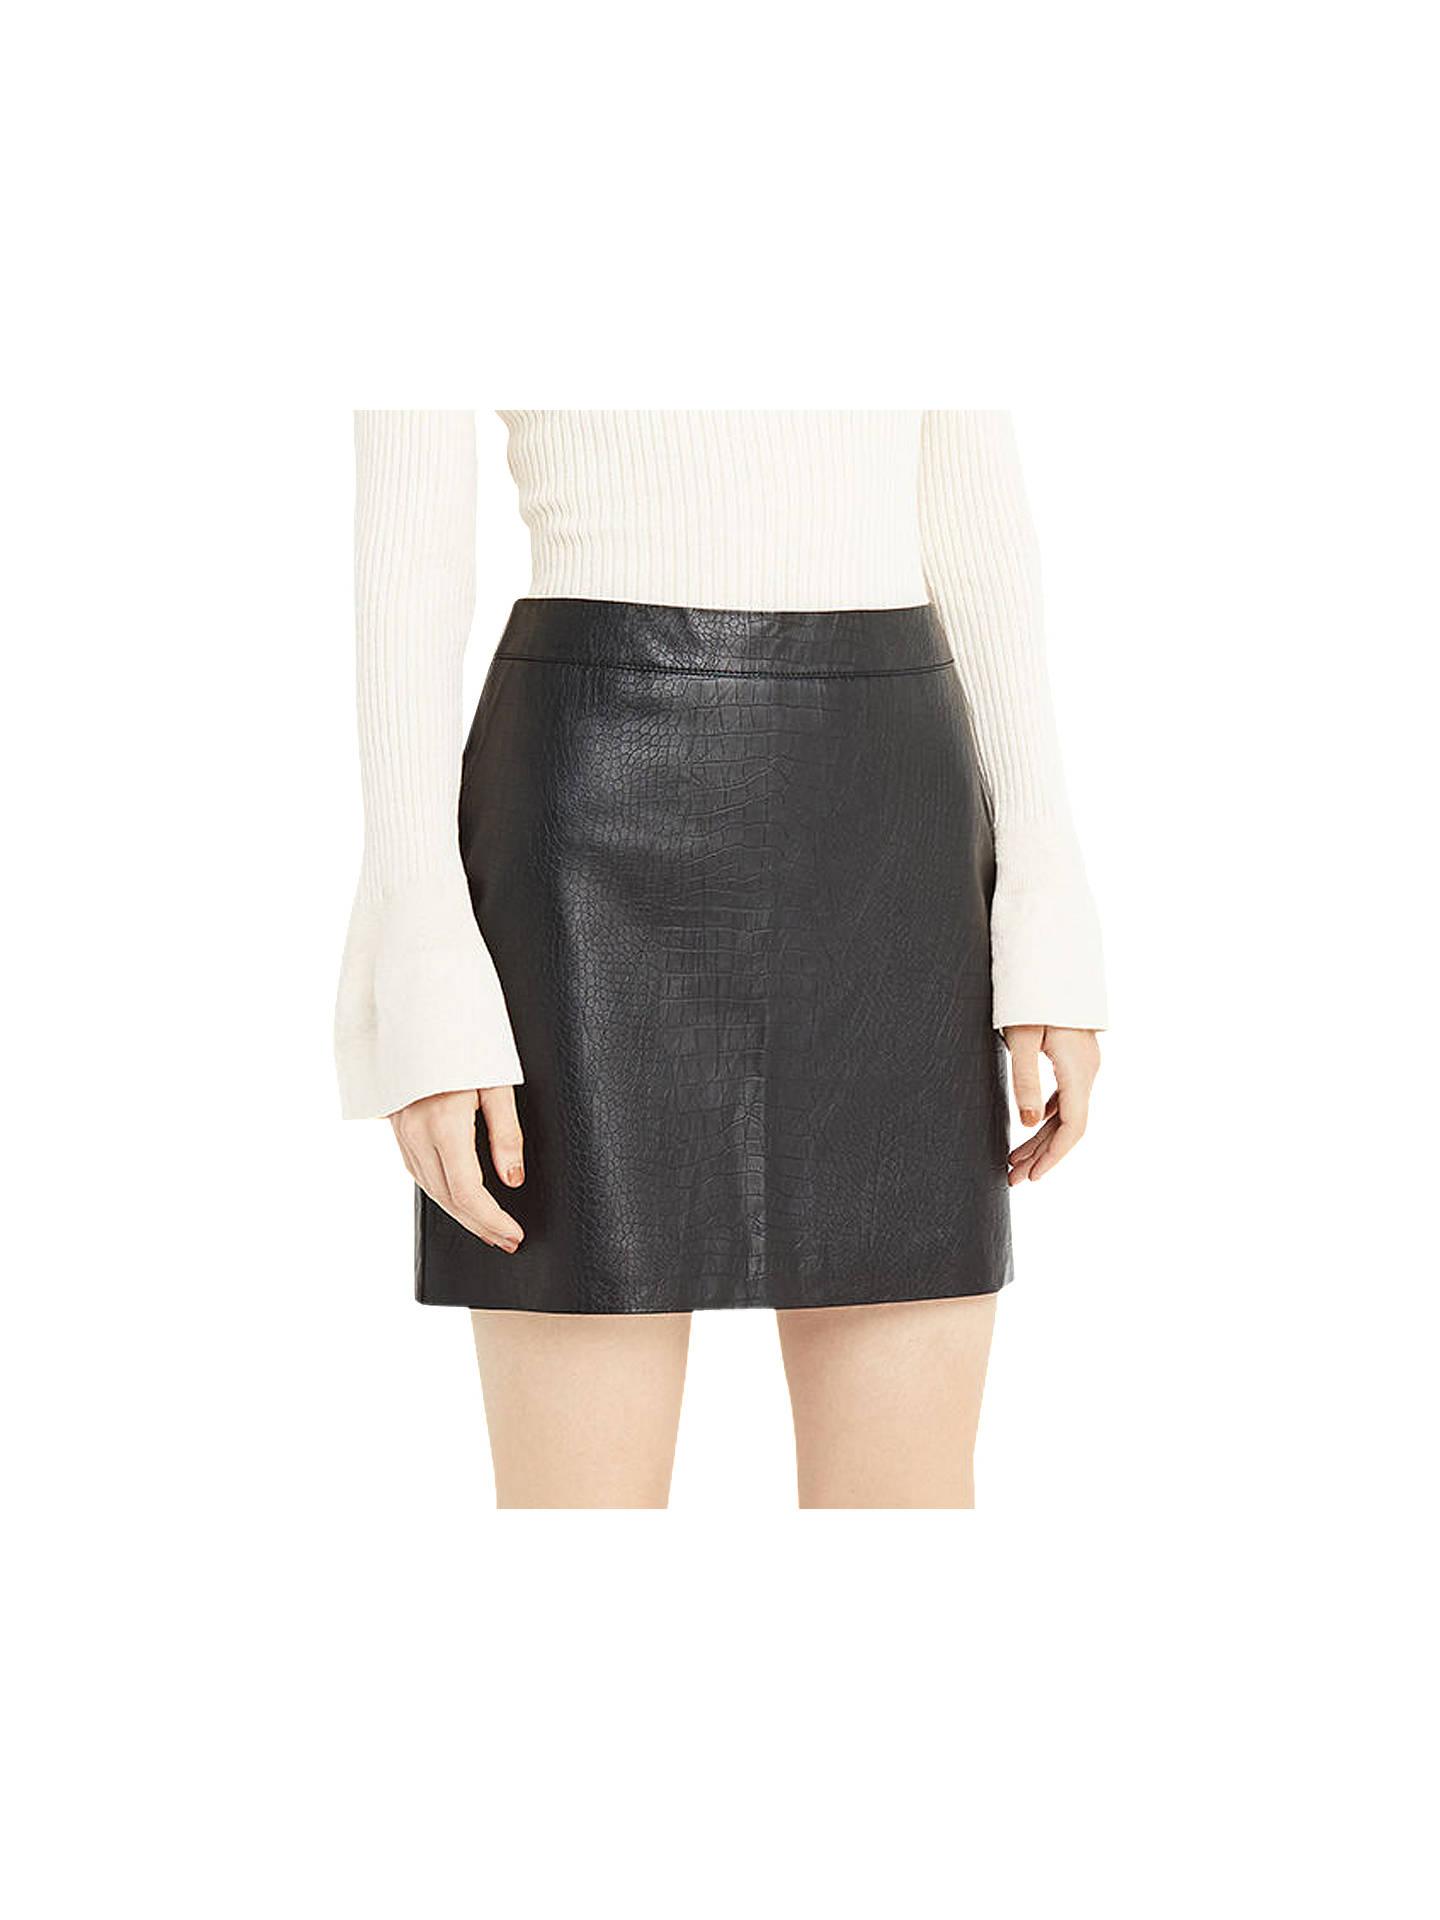 b496289ef9ad Buy Oasis Faux Leather Croc Mini Skirt, Black, 6 Online at johnlewis.com ...